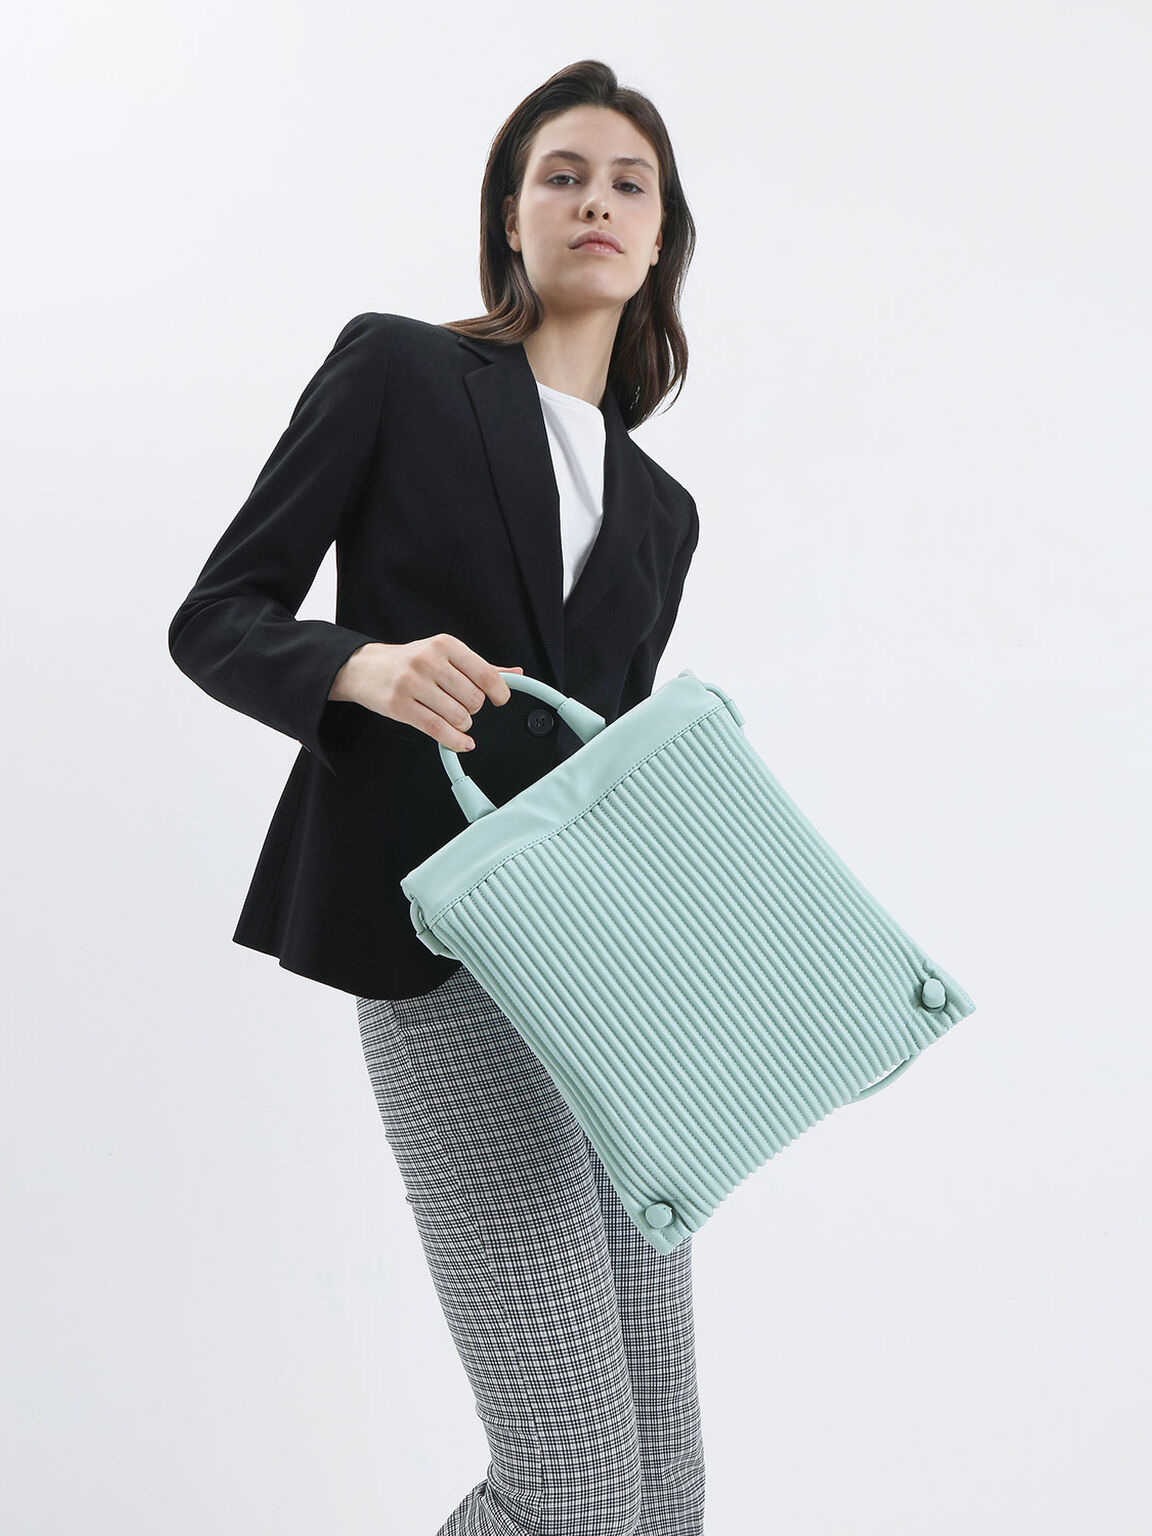 Textured Drawstring Backpack, Mint Green, hi-res